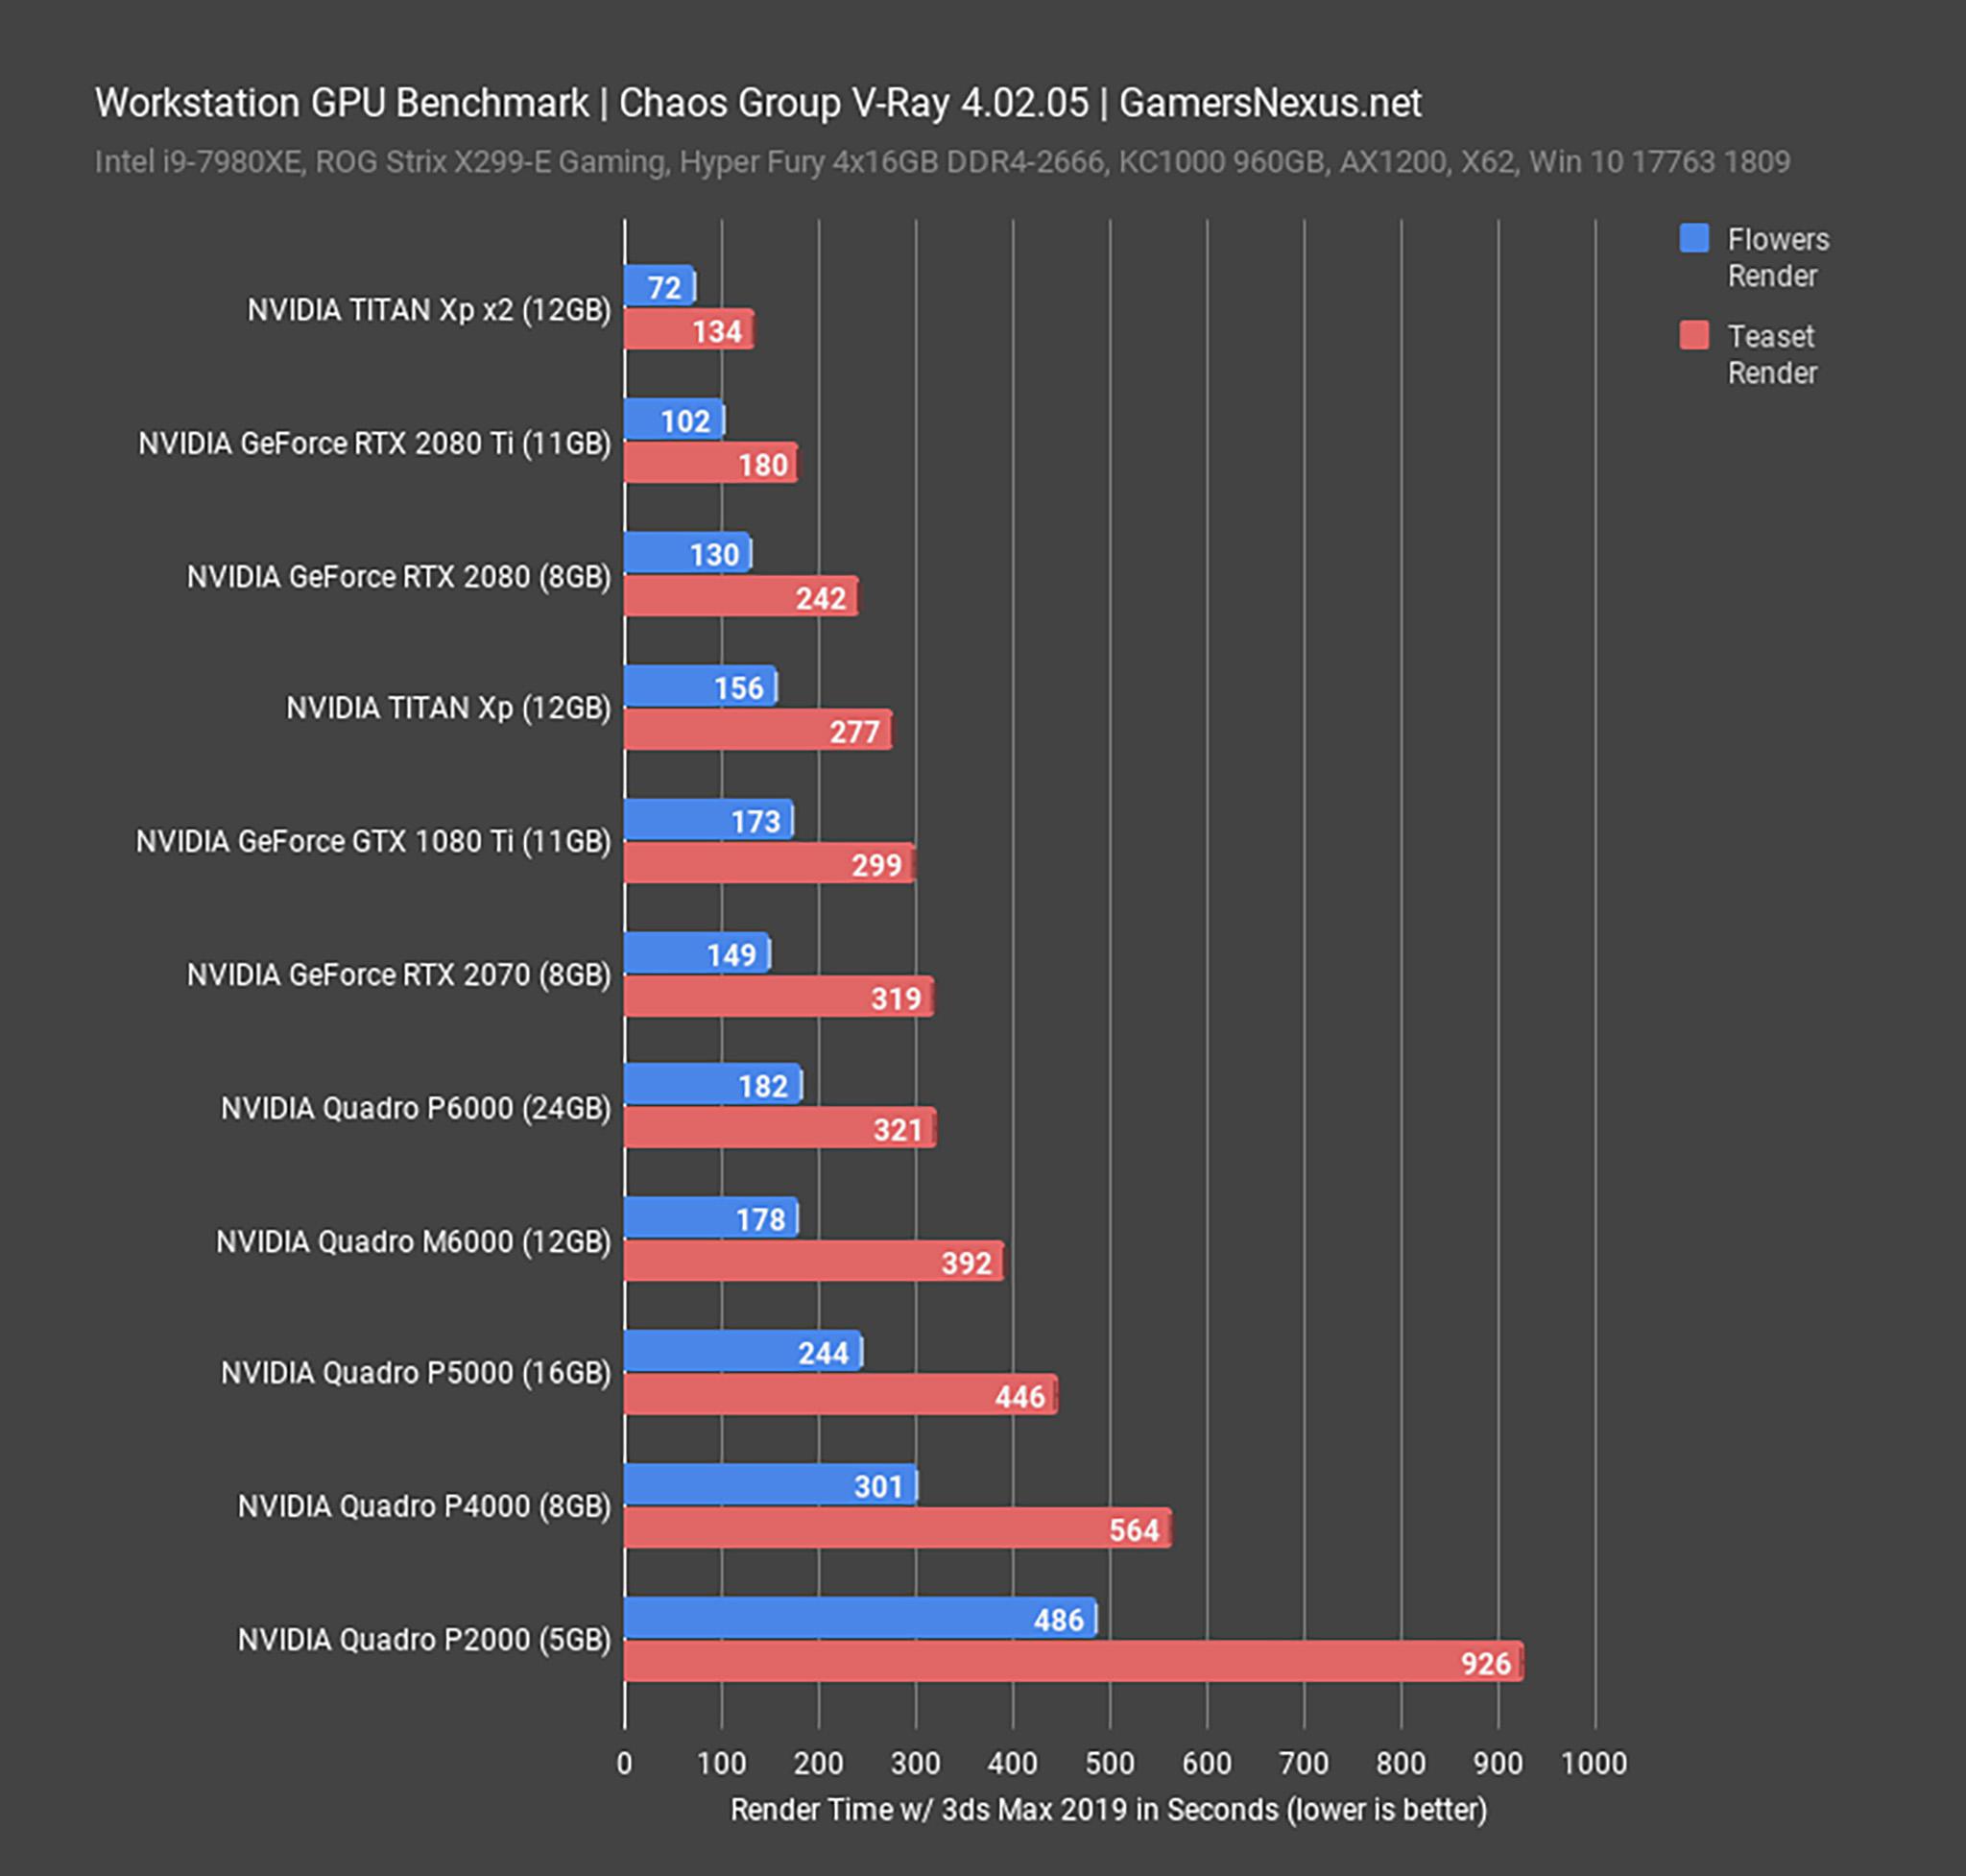 workstation-gpu-benchmark_chaos-vray.jpg